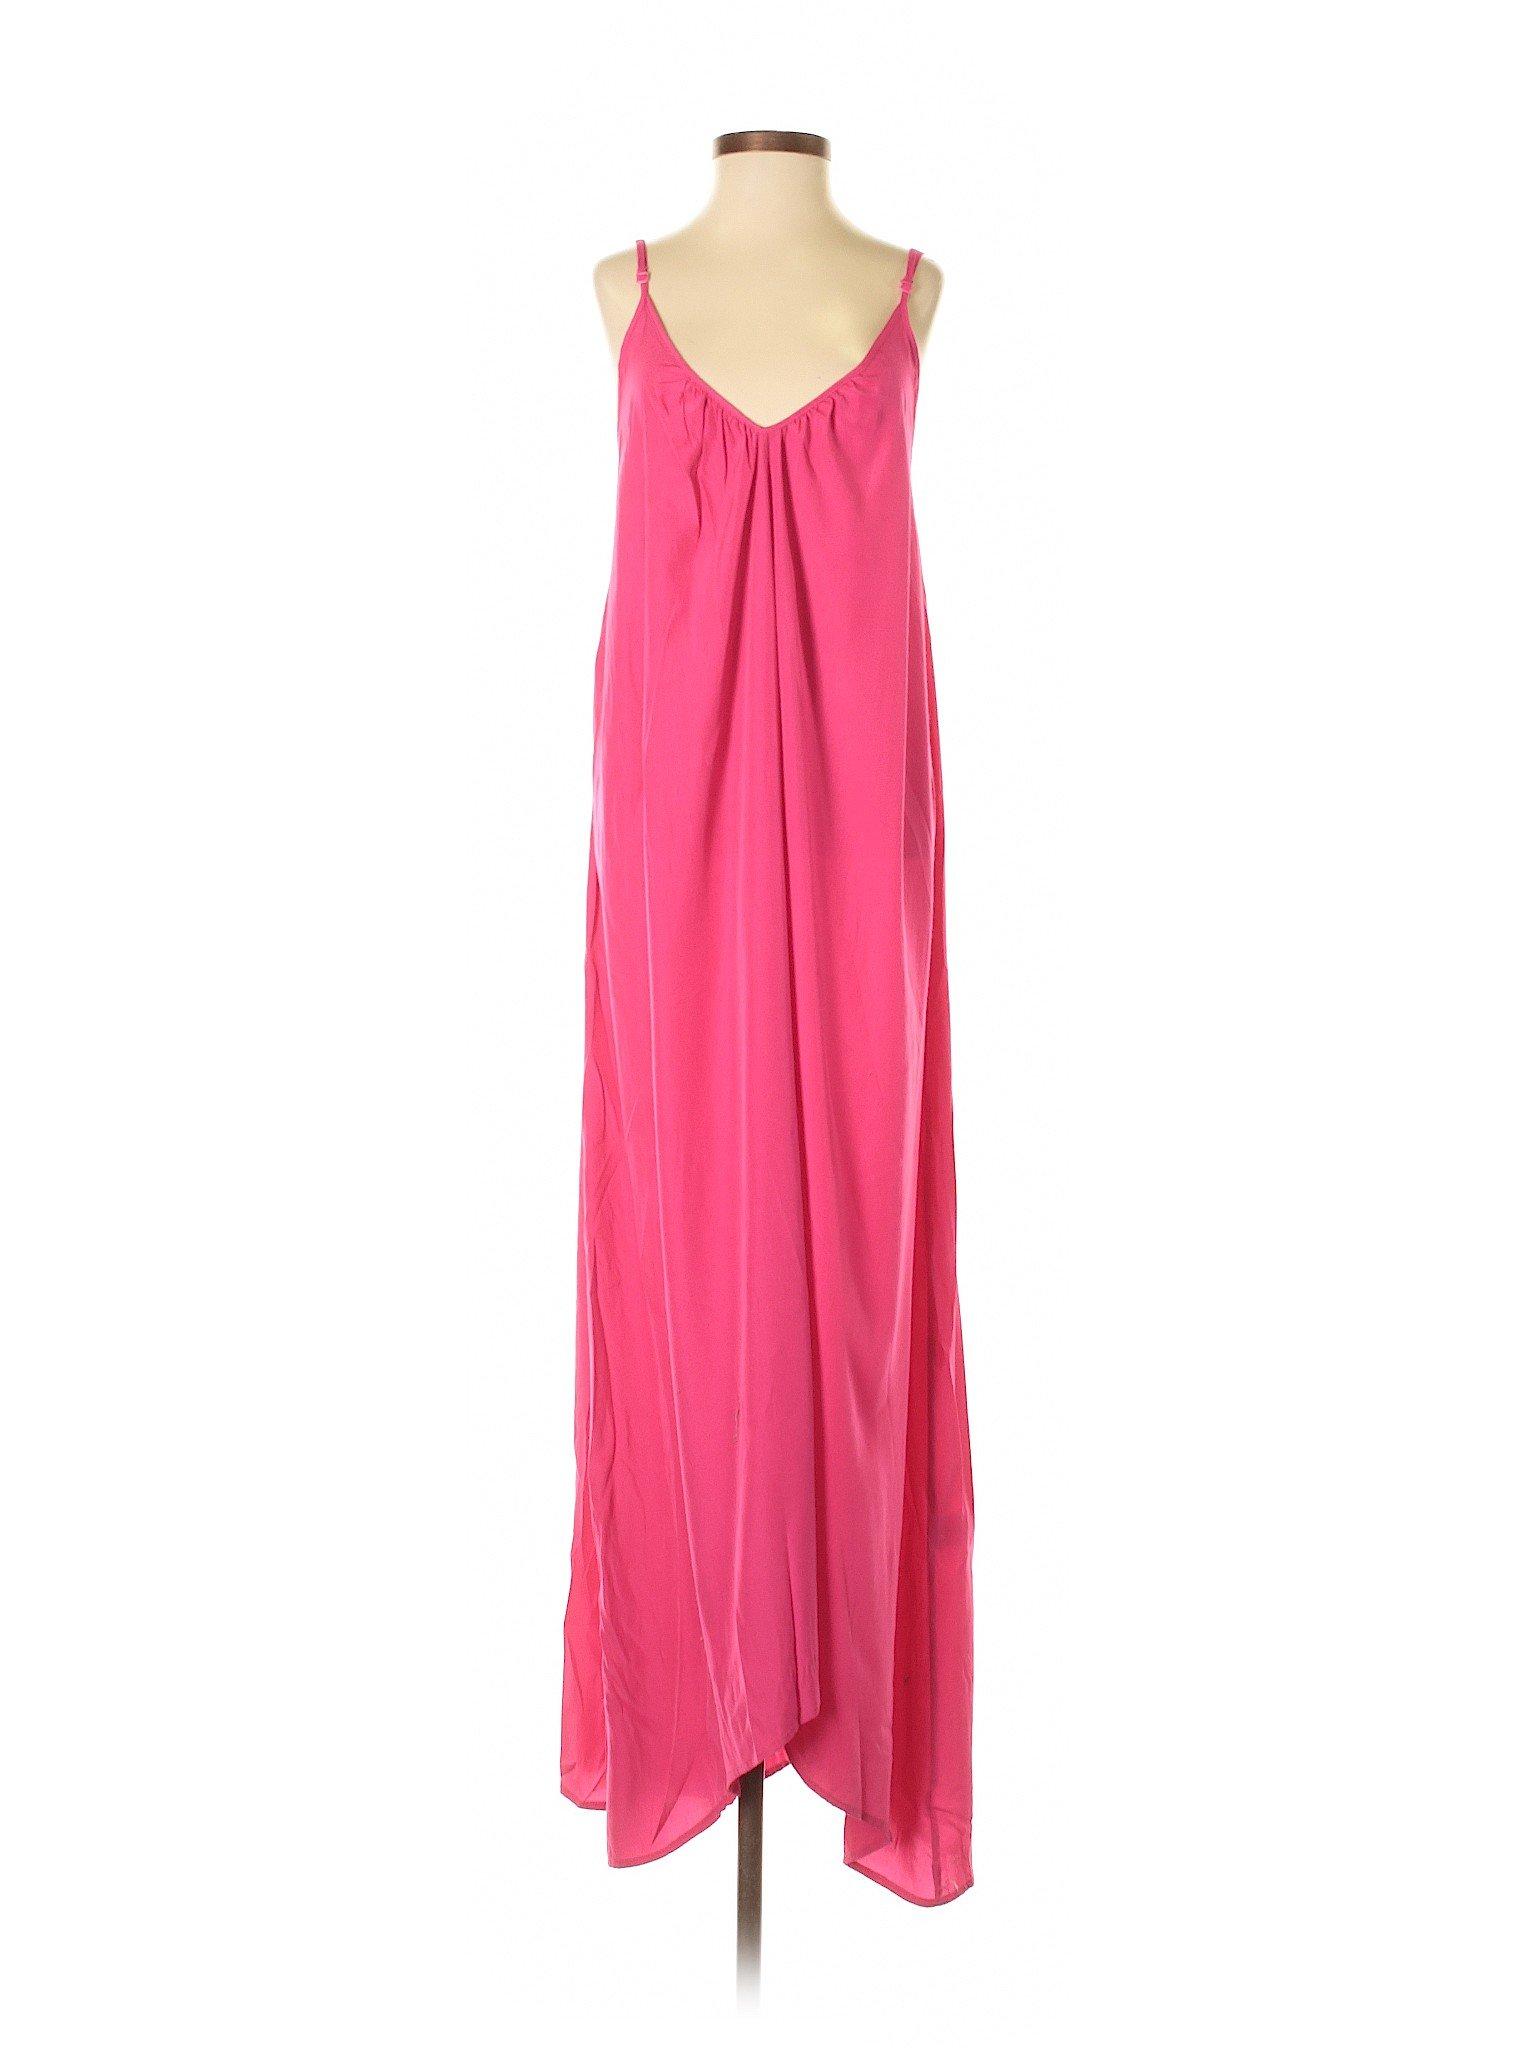 Boutique Casual winter Dress Stitch Pink 8pW8gtrqw